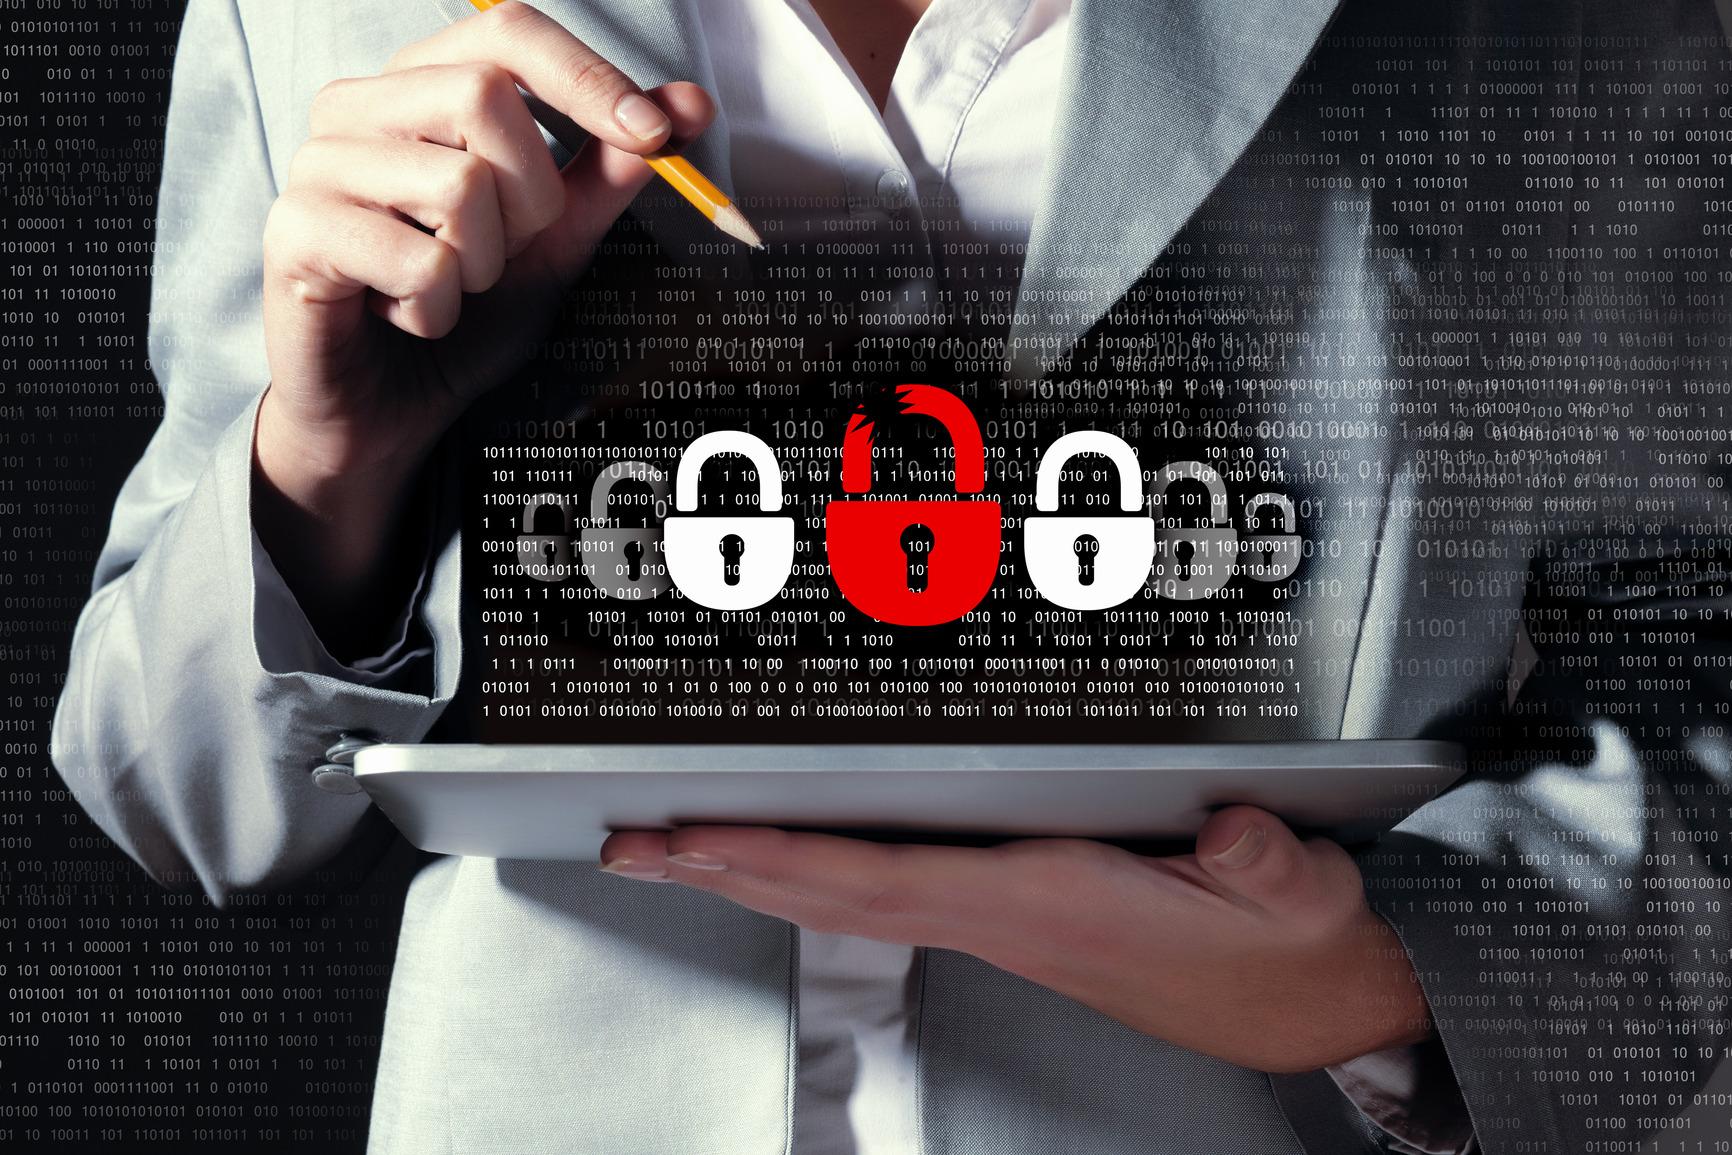 Cryptolocker: torna all'attacco! Nuova versione mail SDA